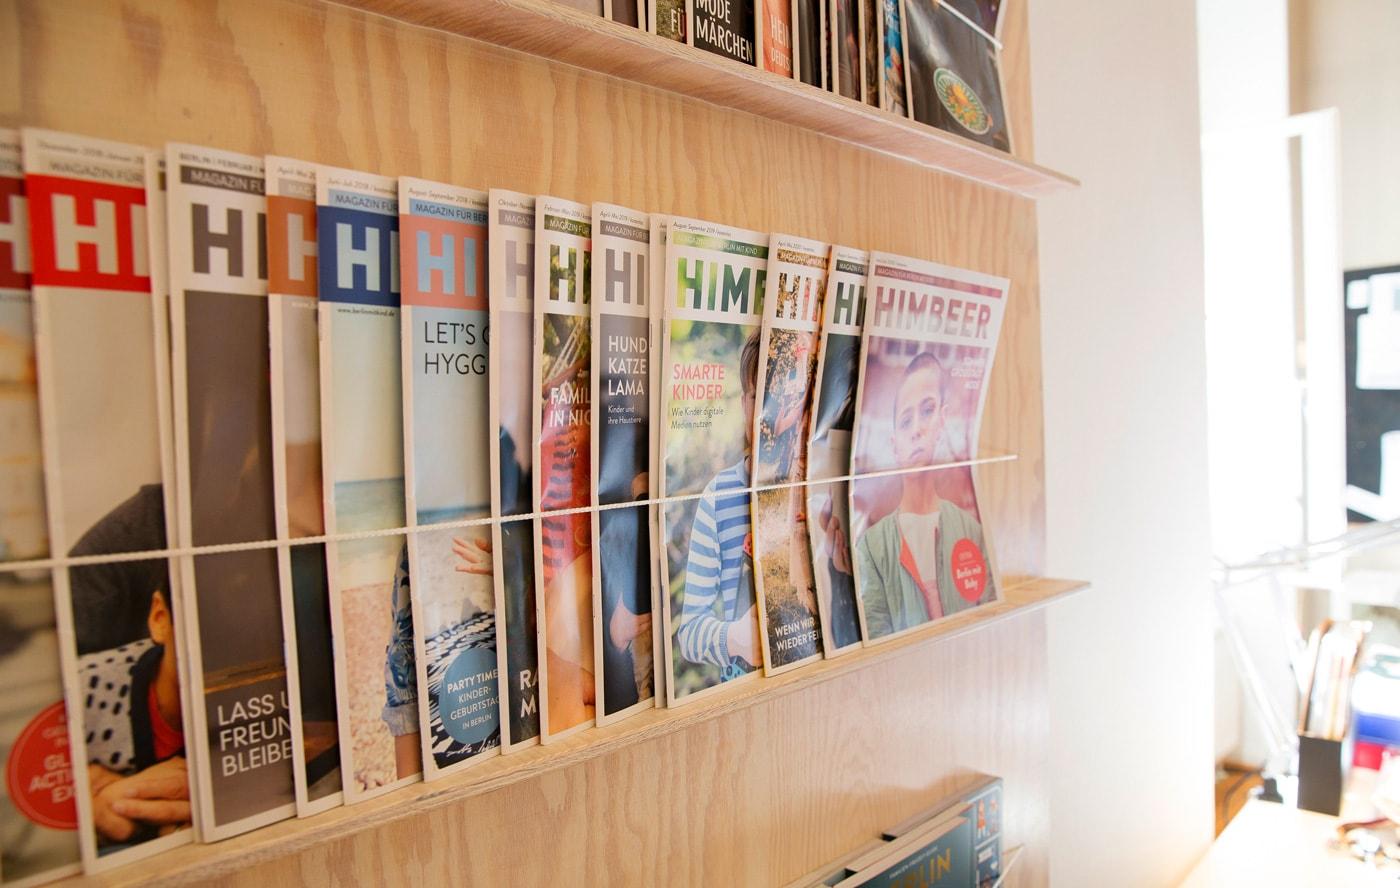 HIMBEER Verlag: Print- und Online-Medien für Familien // HIMBEER